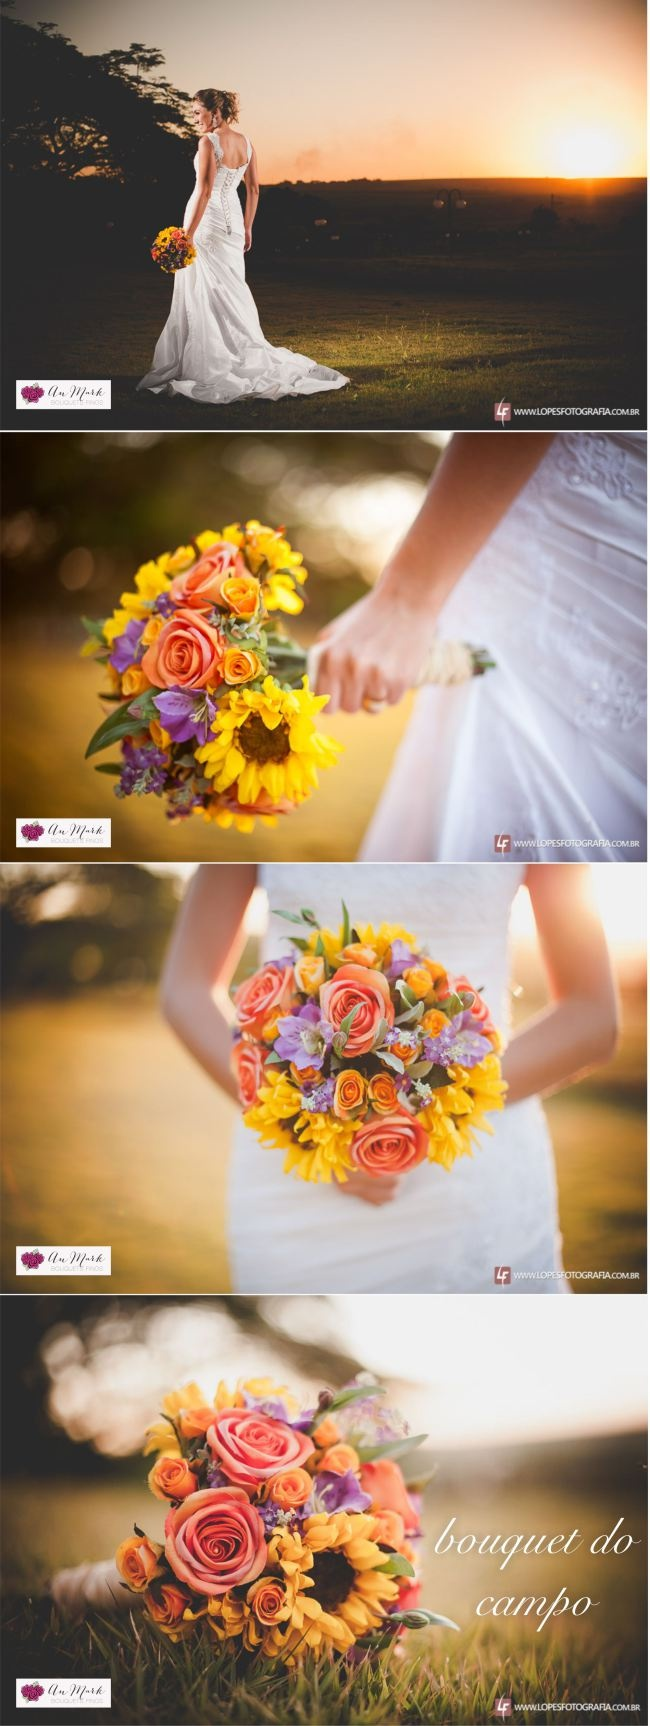 Bouquet de Noiva / Bouquet de Flores do Campo / Bouquet Artificial / An Mark - Bouquets Finos / Buque / Girassol